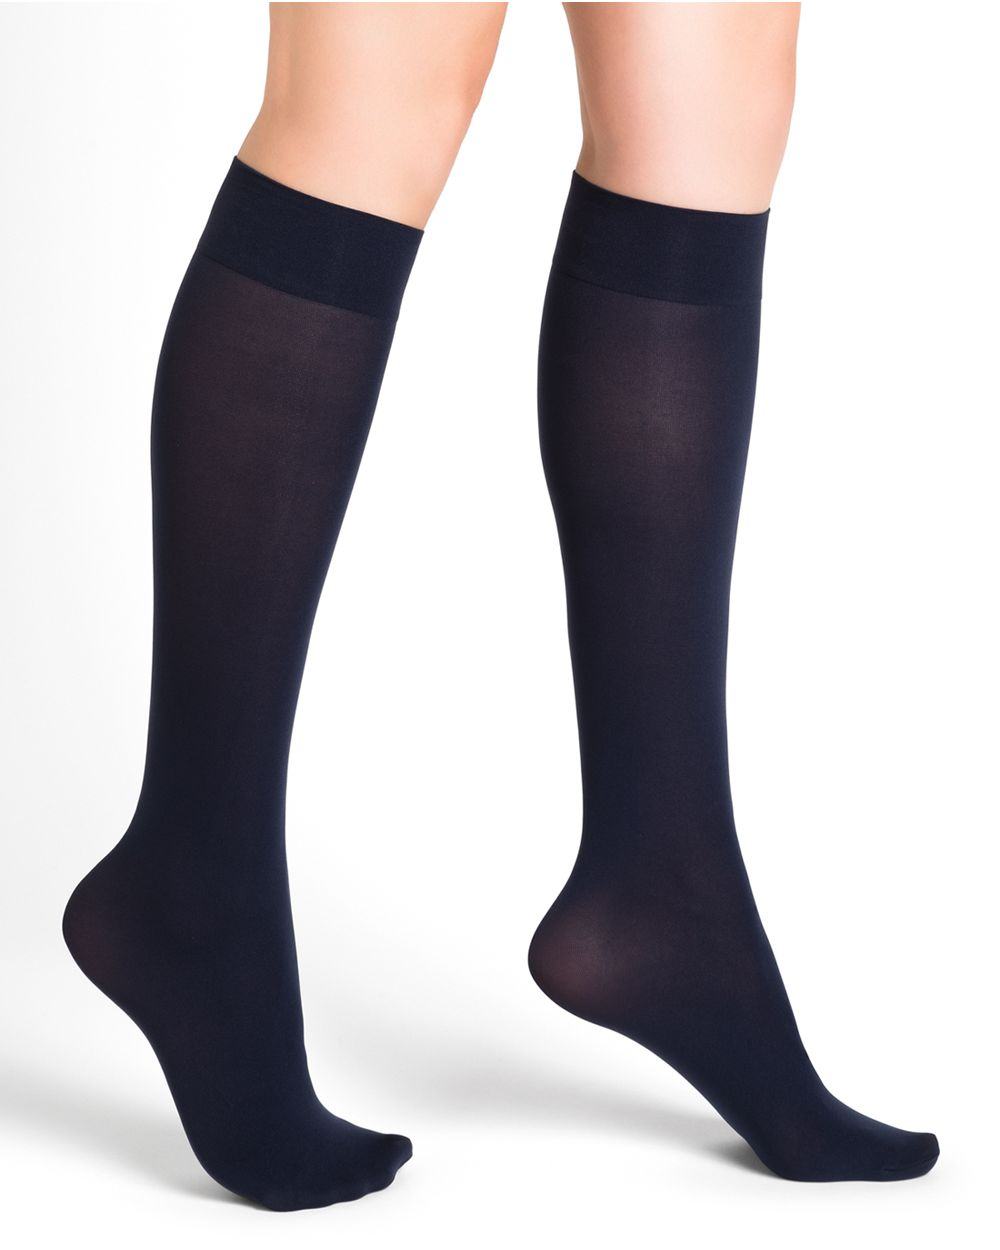 Velvet touch opaque 50D knee highs